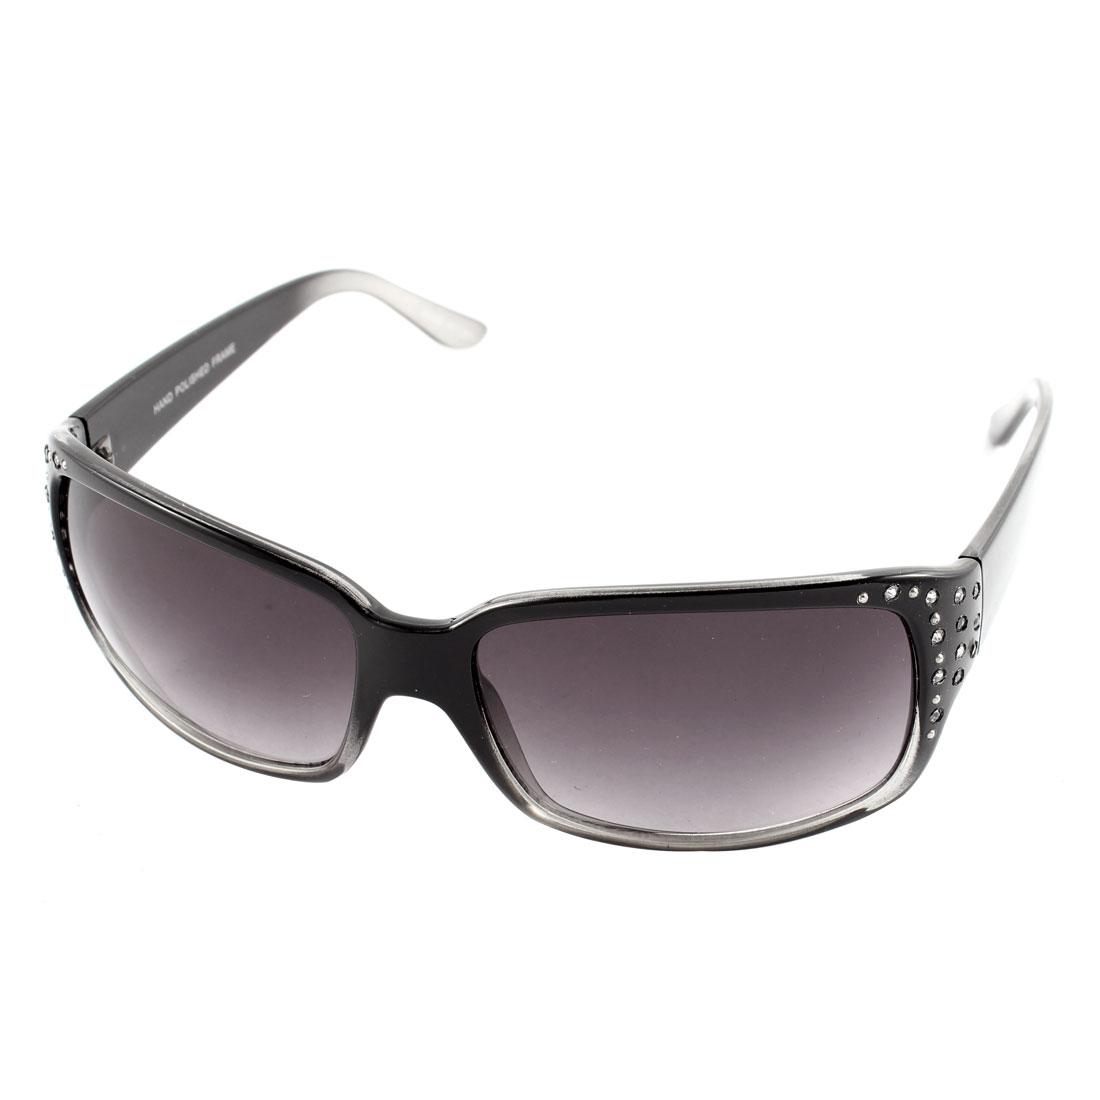 Rhinestone Decor Lady Sun Protection Eyewear Sunglasses Gradient Color